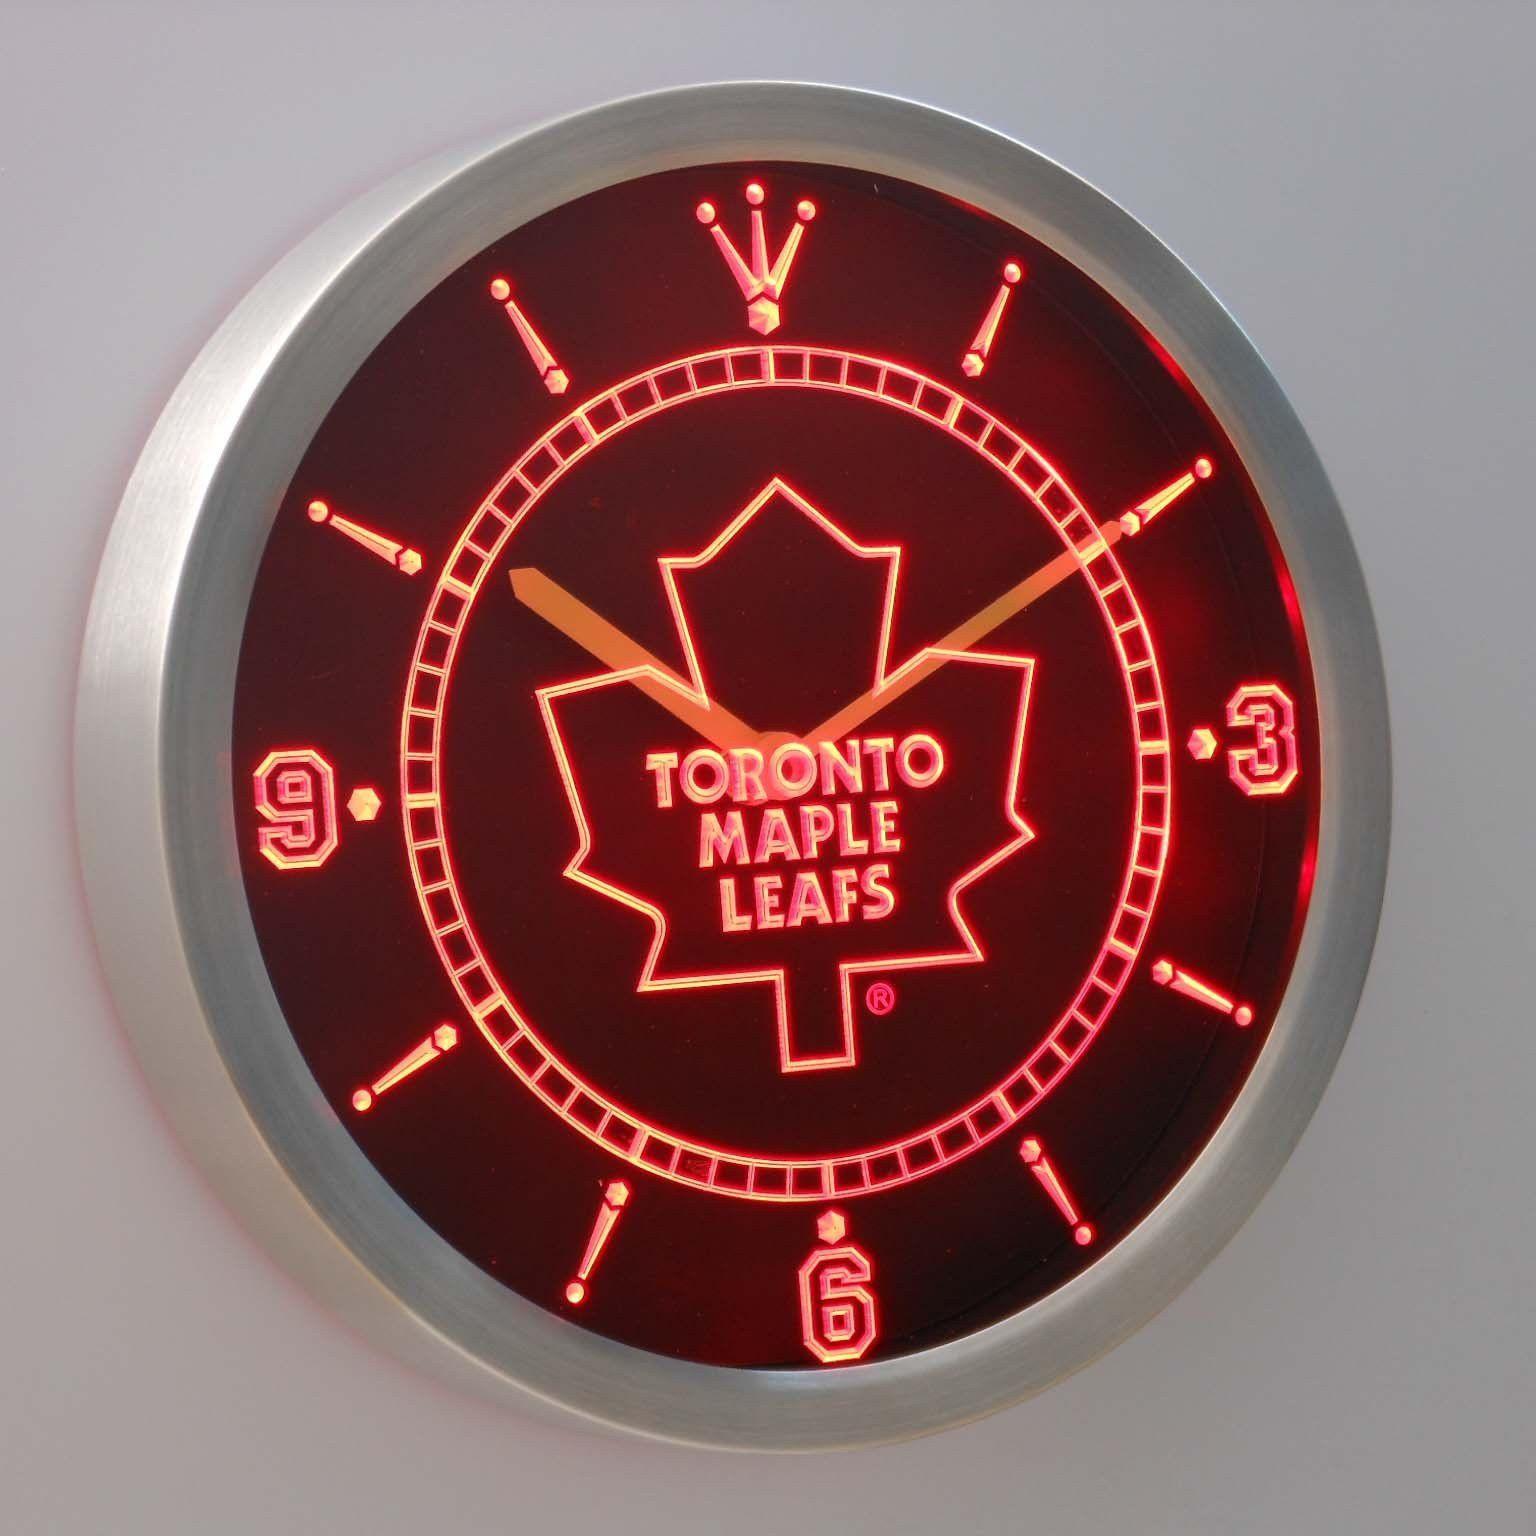 Toronto Maple Leafs Led Neon Wall Clock Toronto Maple Leafs